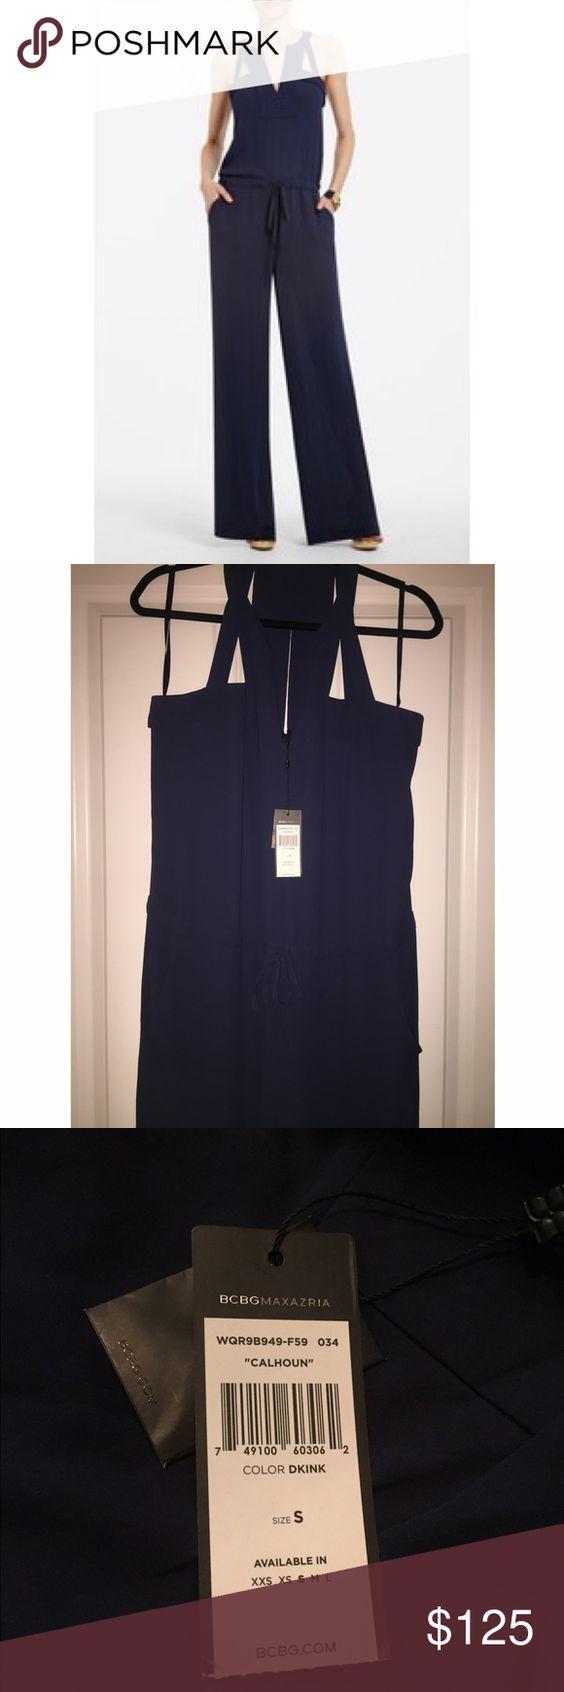 "BCBG ""Calhoun"" Navy Jumpsuit BCBG ""Calhoun"" wide leg jumpsuit -- navy blue -- size small -- new with tags, never worn ❄️no trades❄️ BCBG Pants Jumpsuits & Rompers"